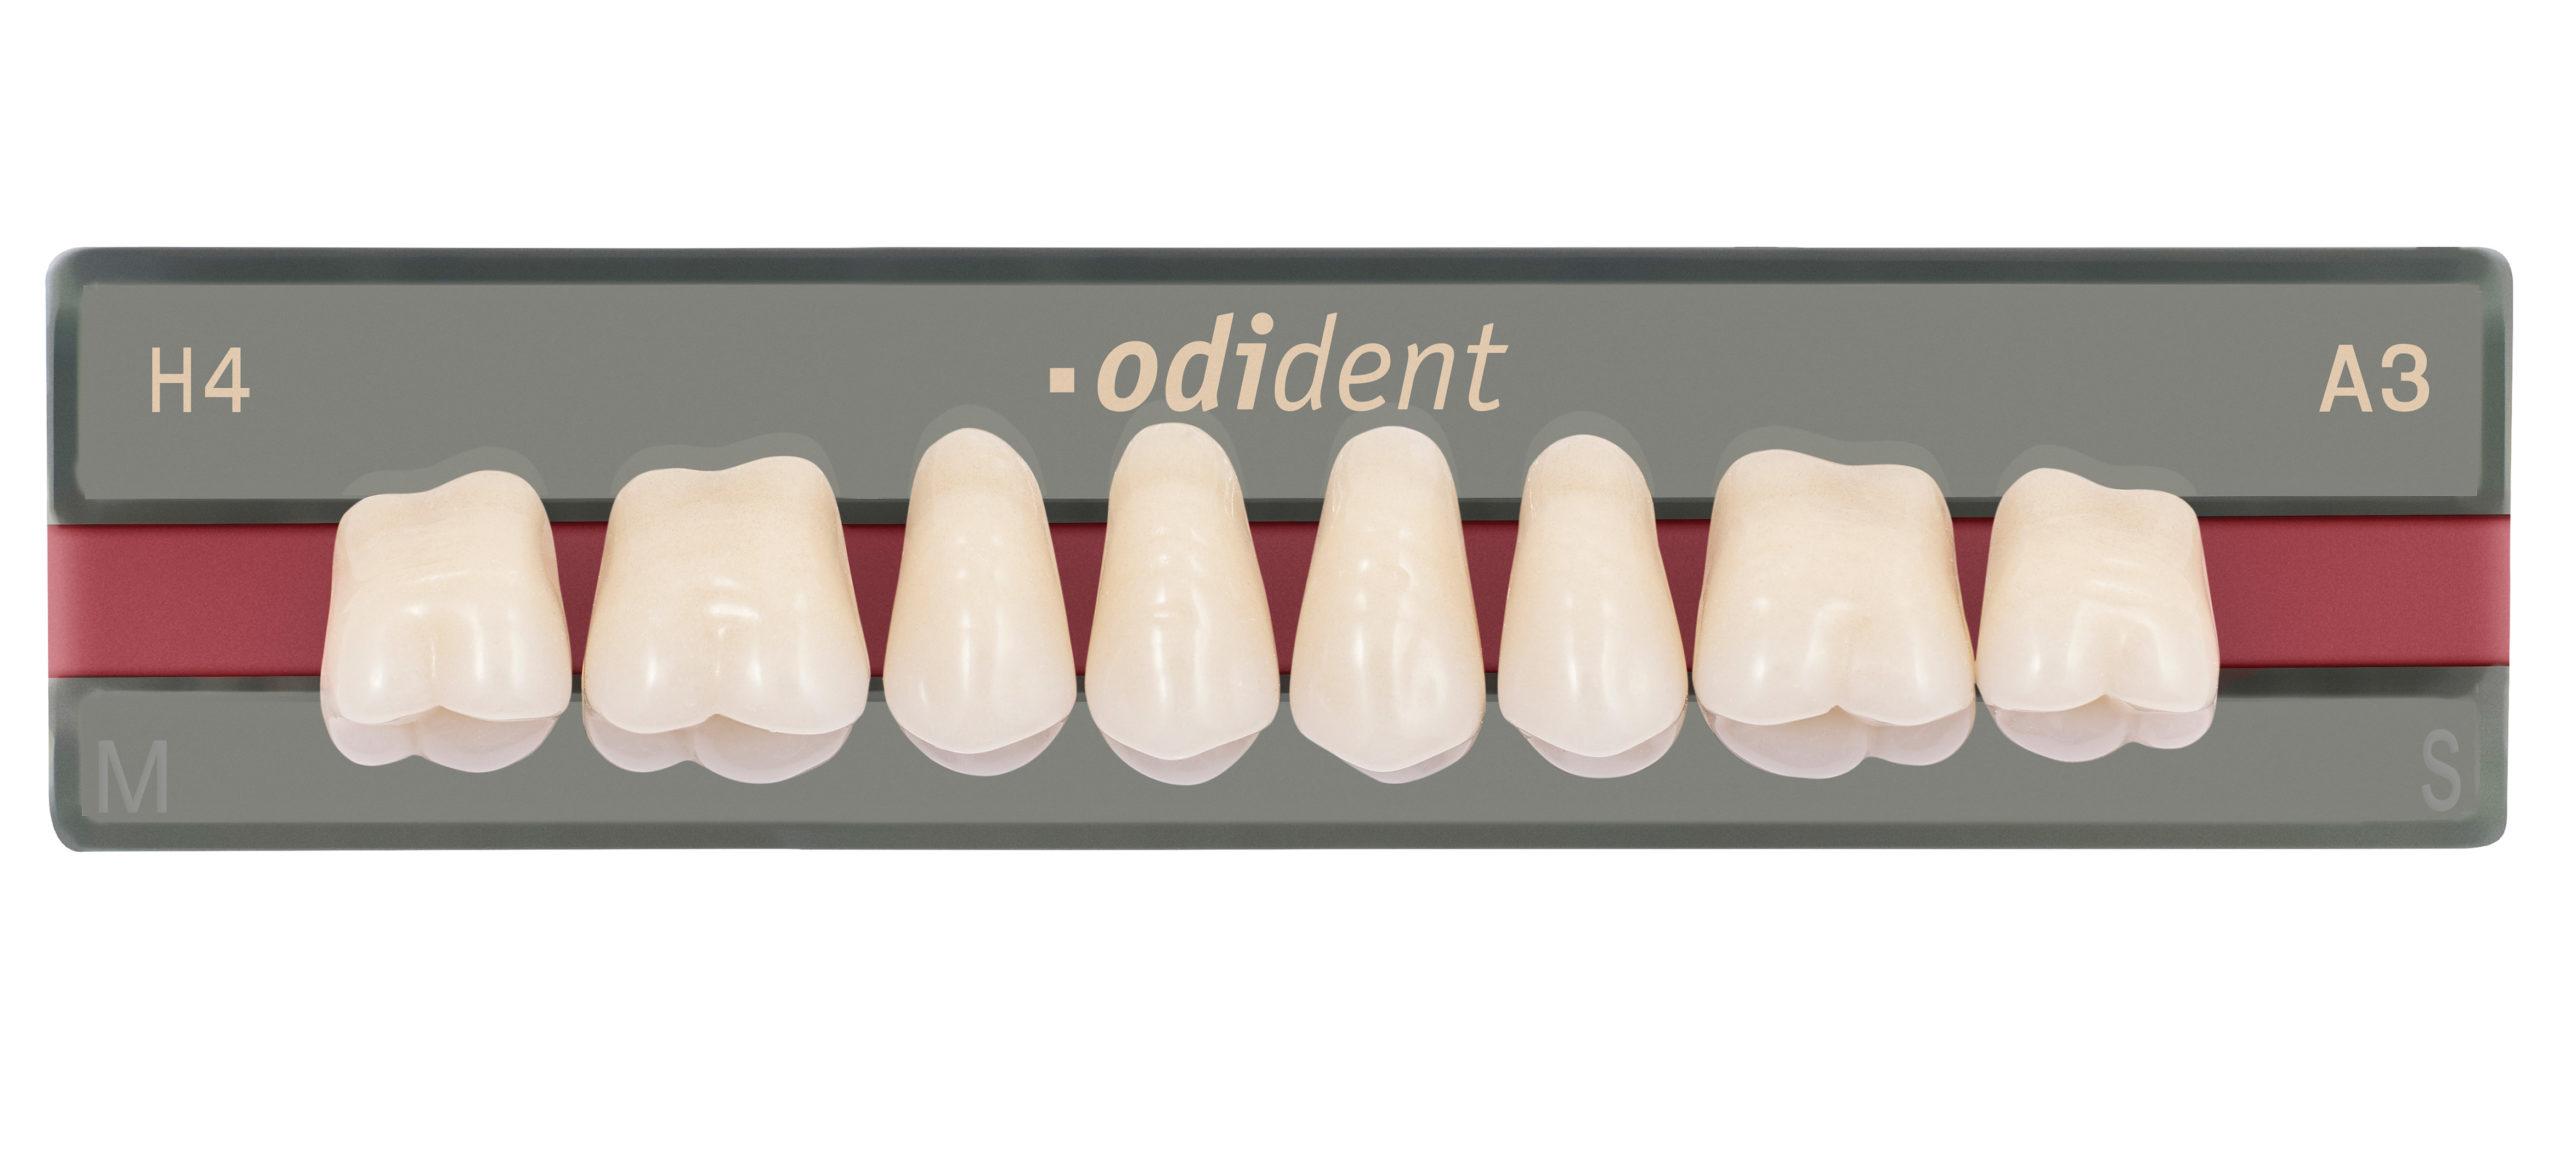 unidesa dientes odident